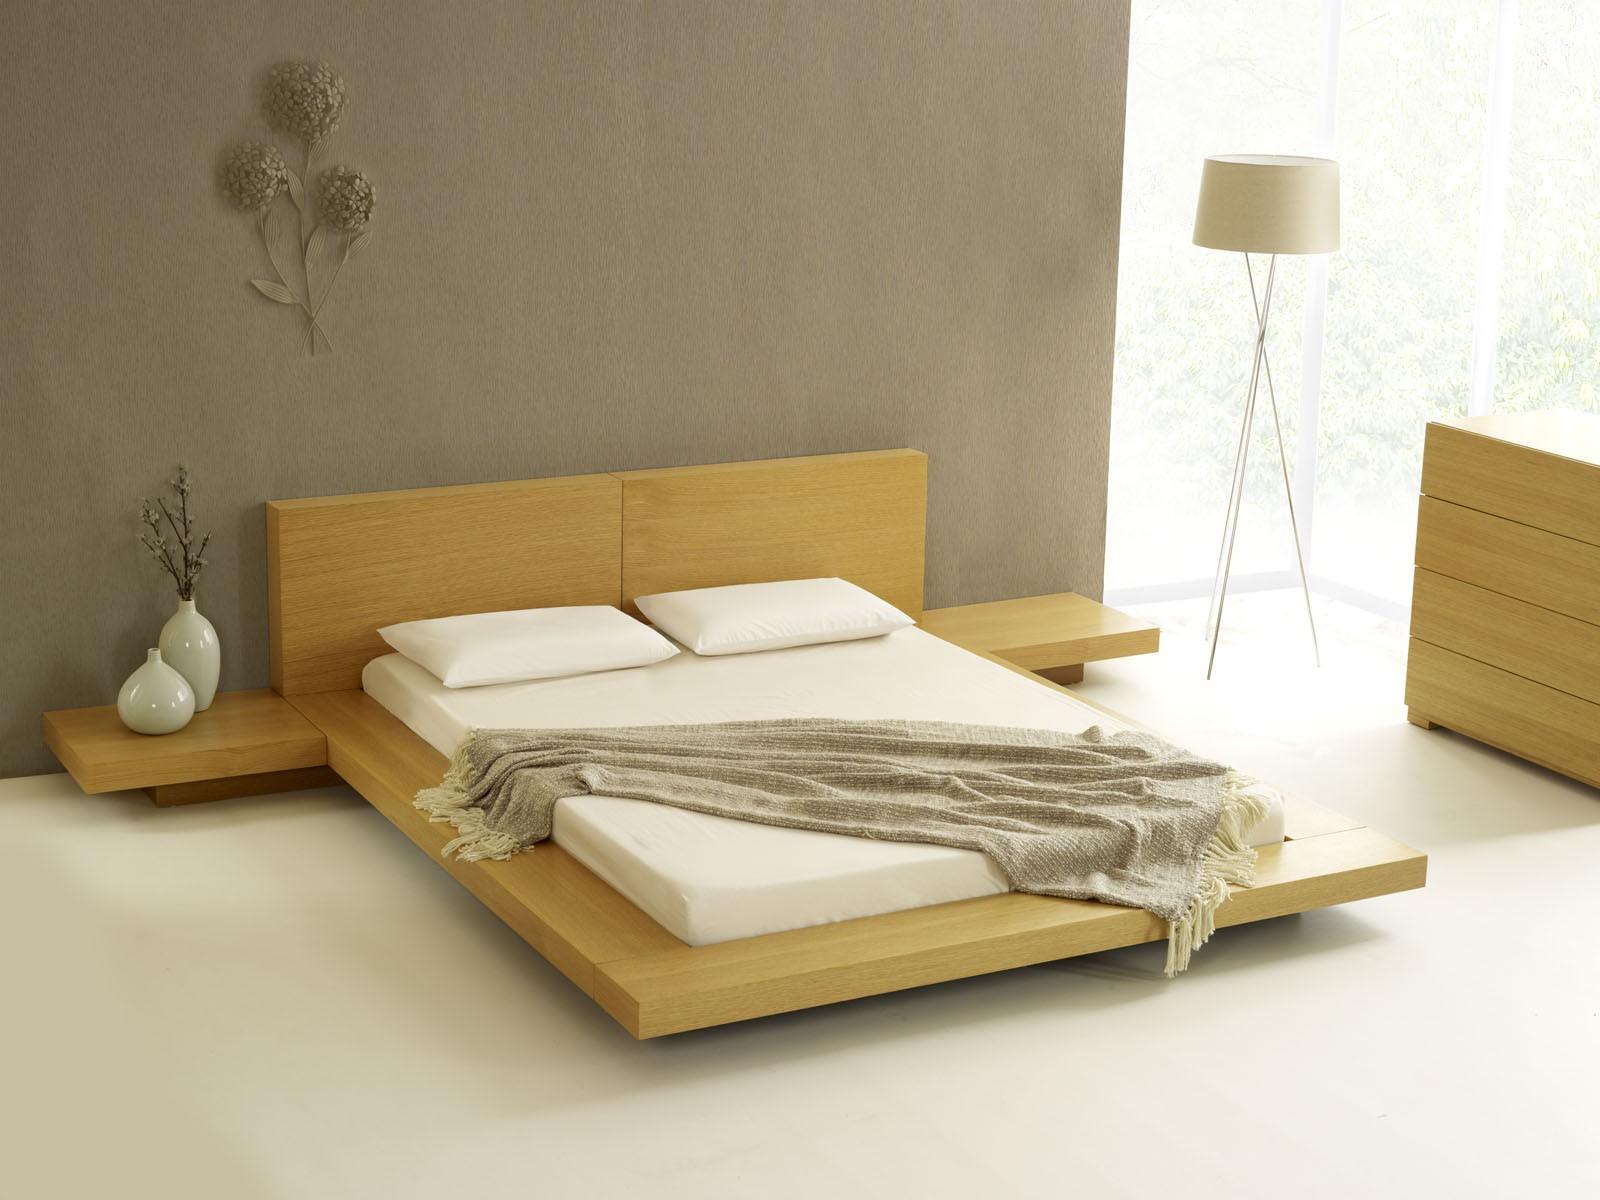 Transformer sa chambre en chambre traditionnelle japonaise.